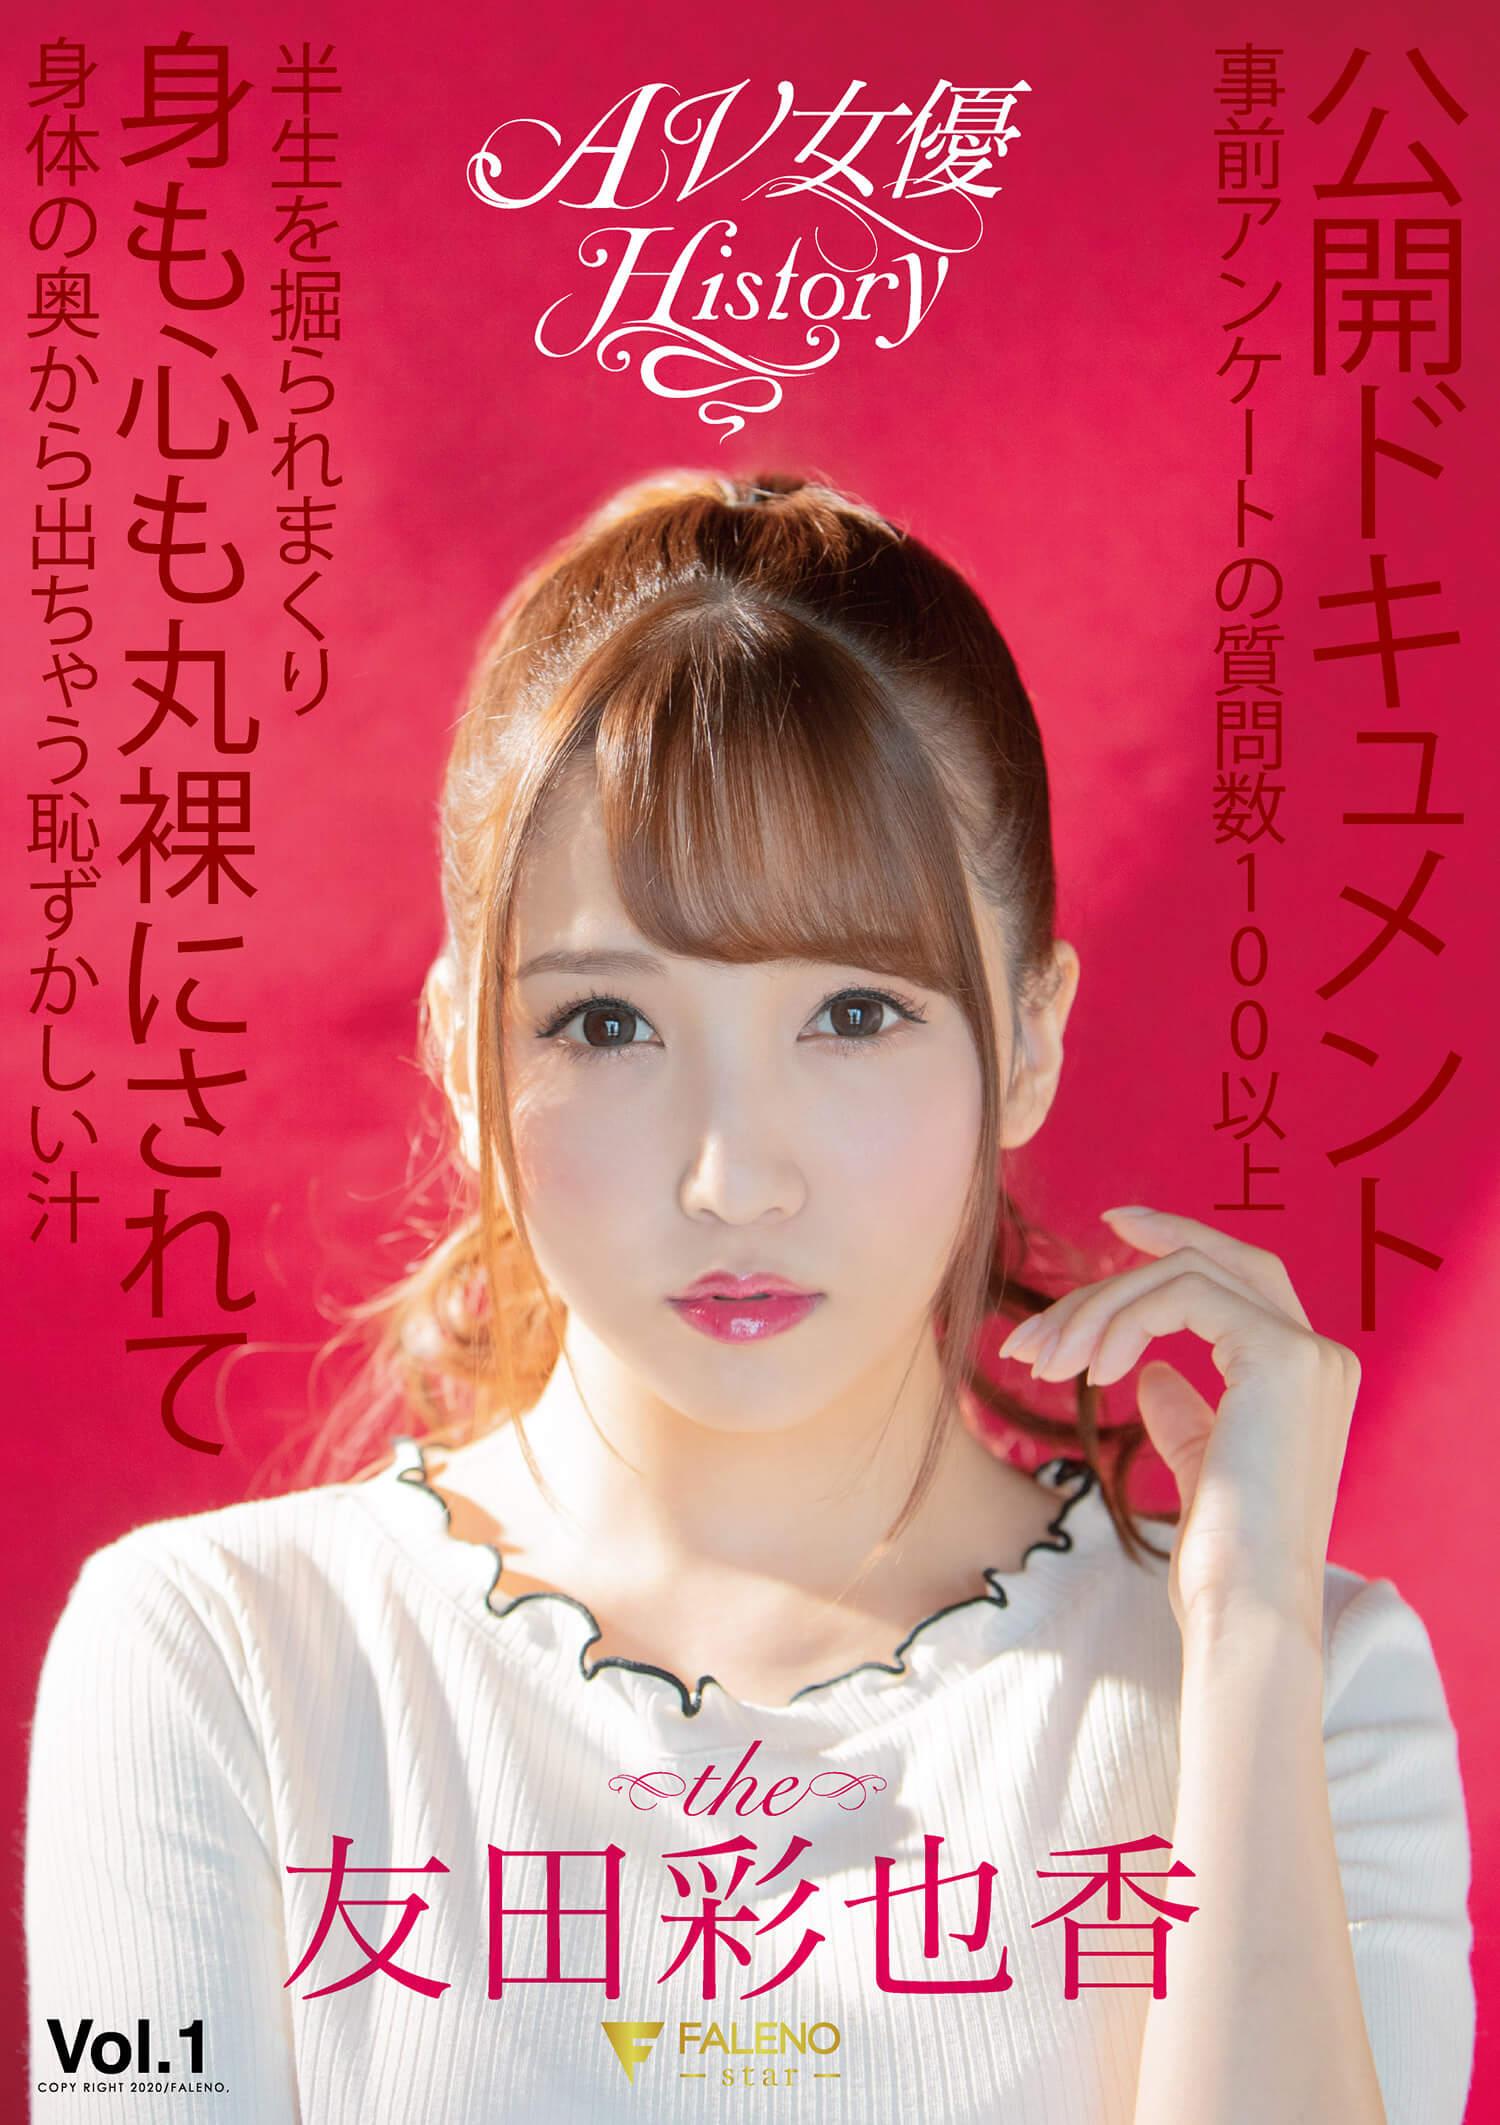 AV女優History the友田彩也香Vol.1